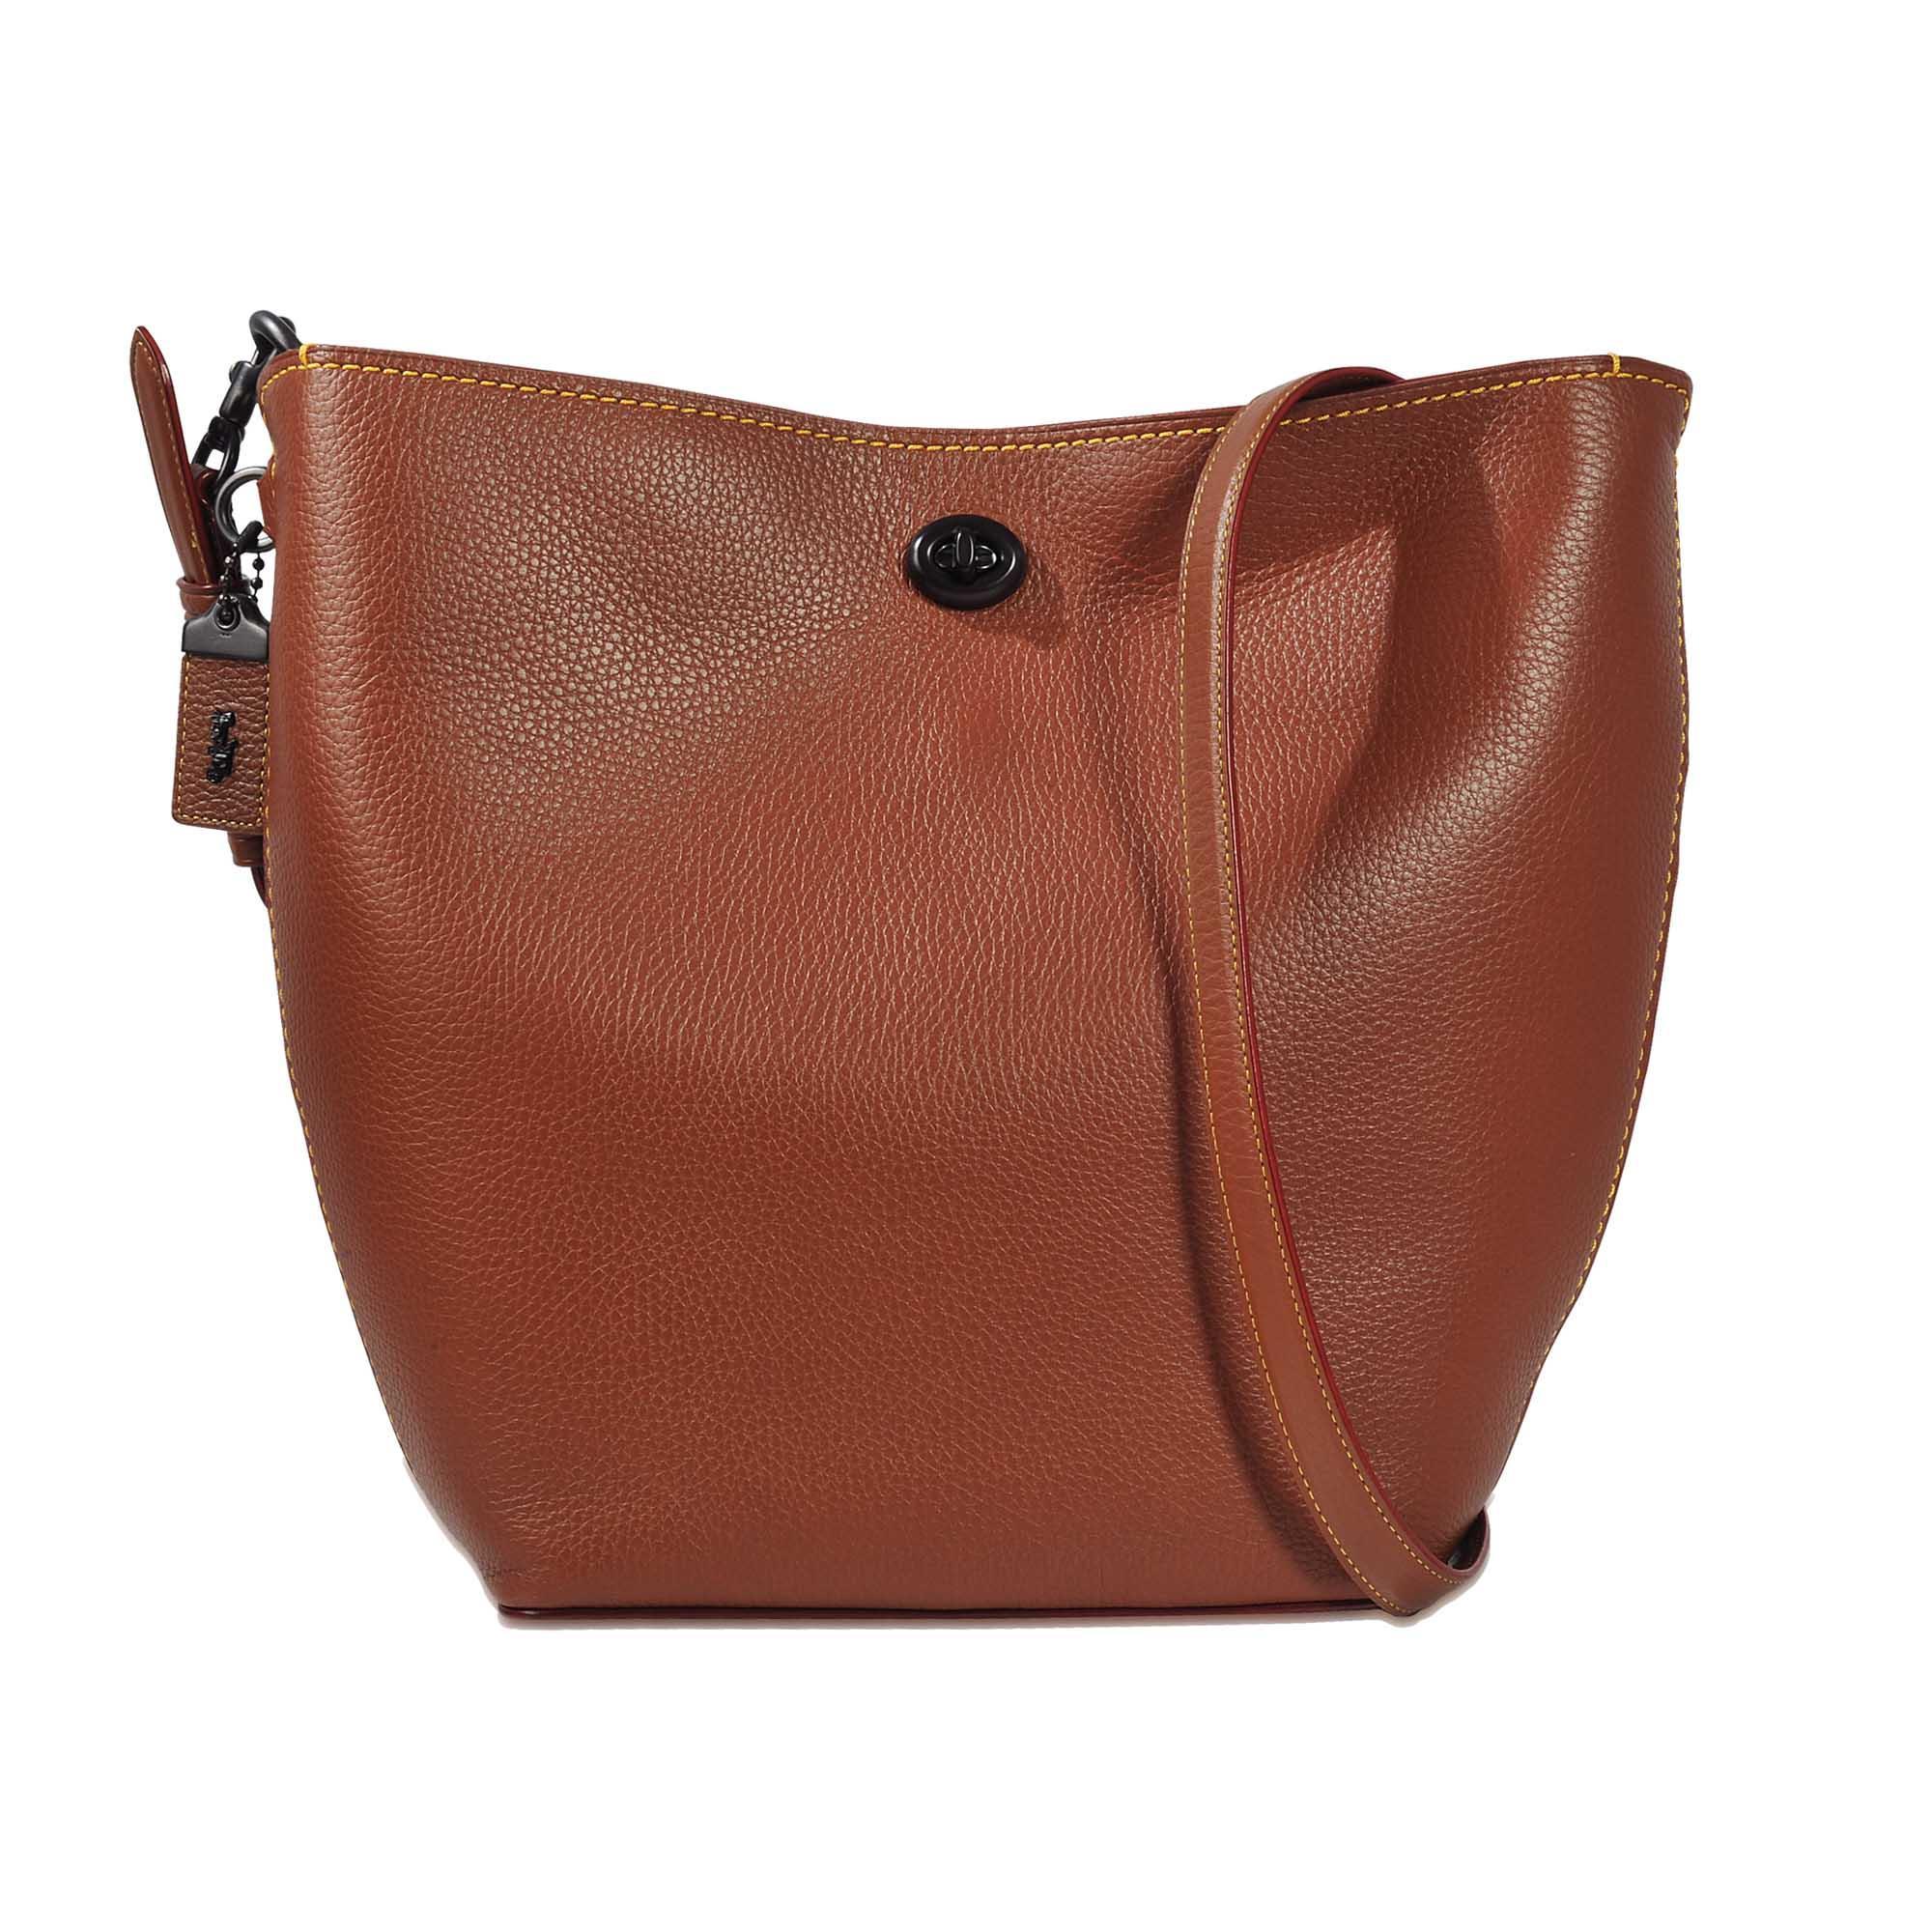 Coach Duffle Bag In Glovetan Leather in Brown